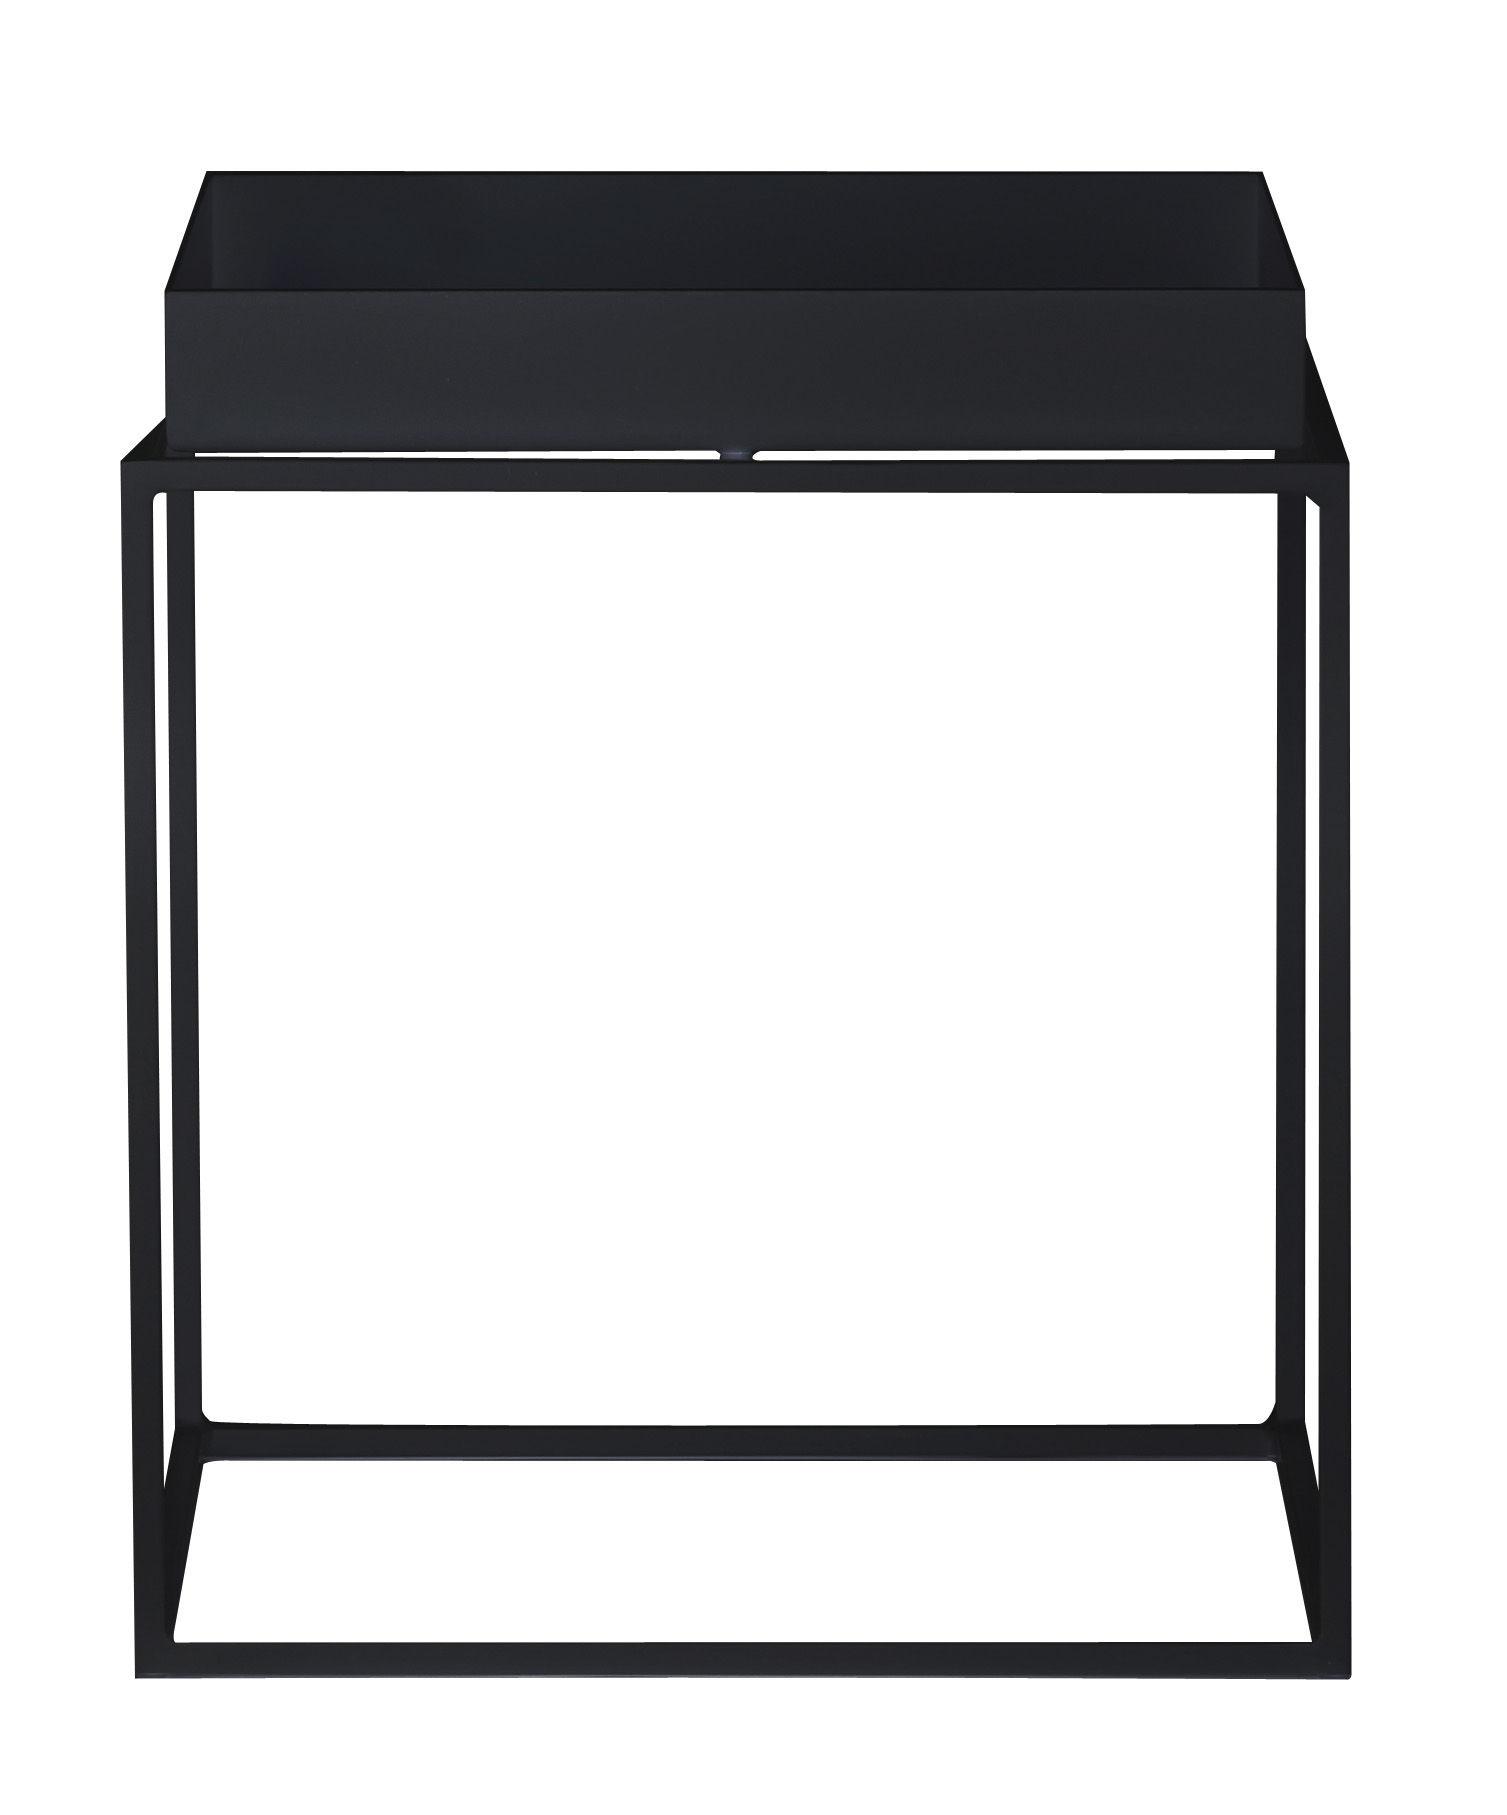 Tray Coffee Table Square H 30 Cm 30 X 30 Cm Black By Hay